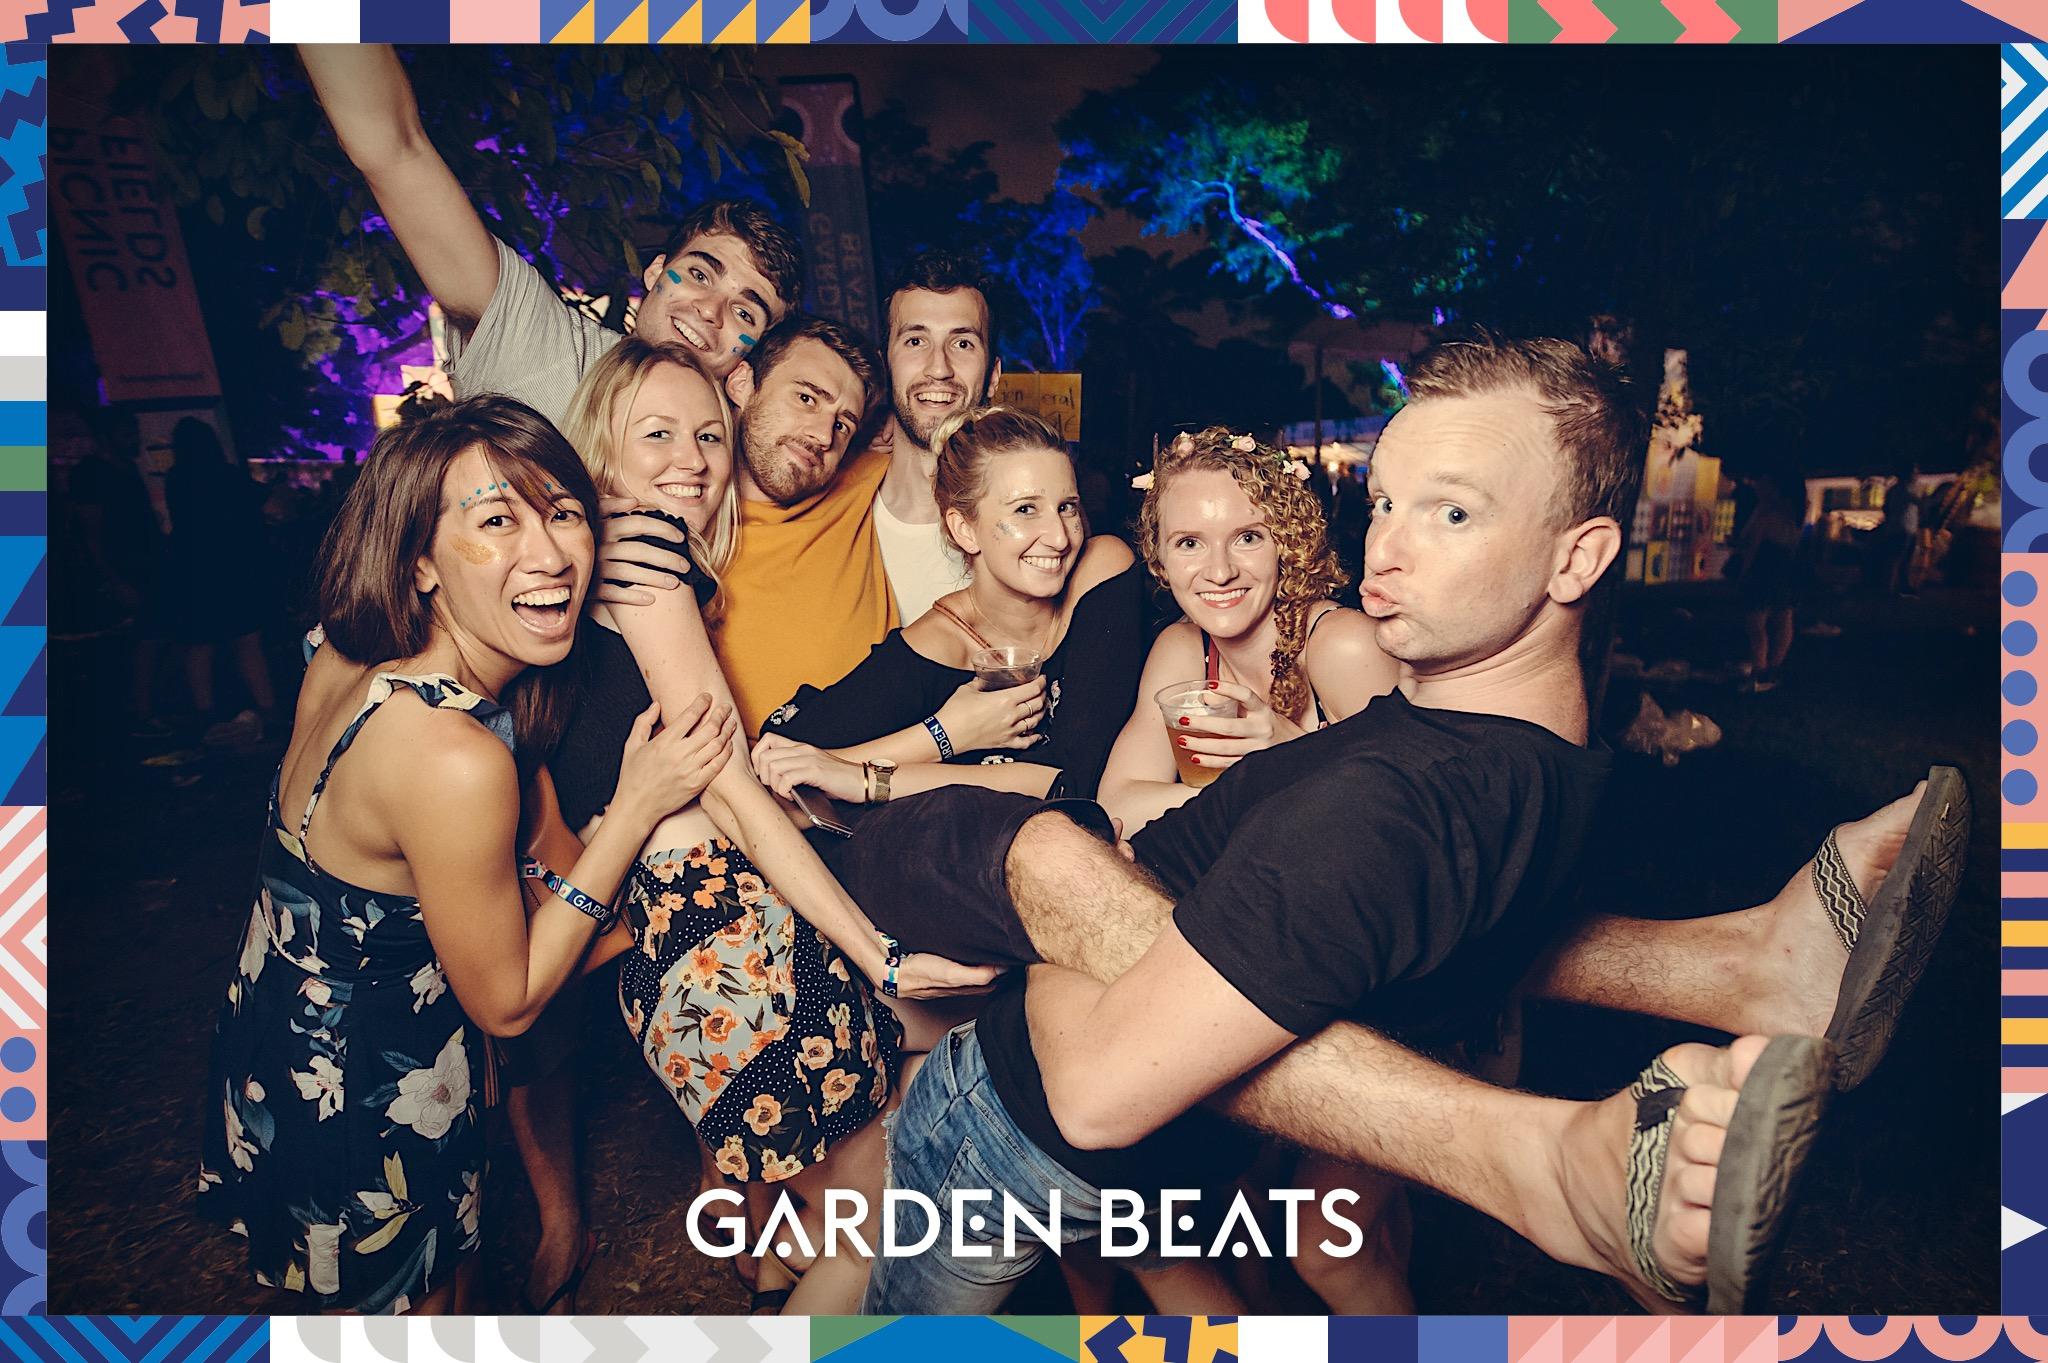 03032018_GardenBeats_Colossal946_Watermarked.jpg